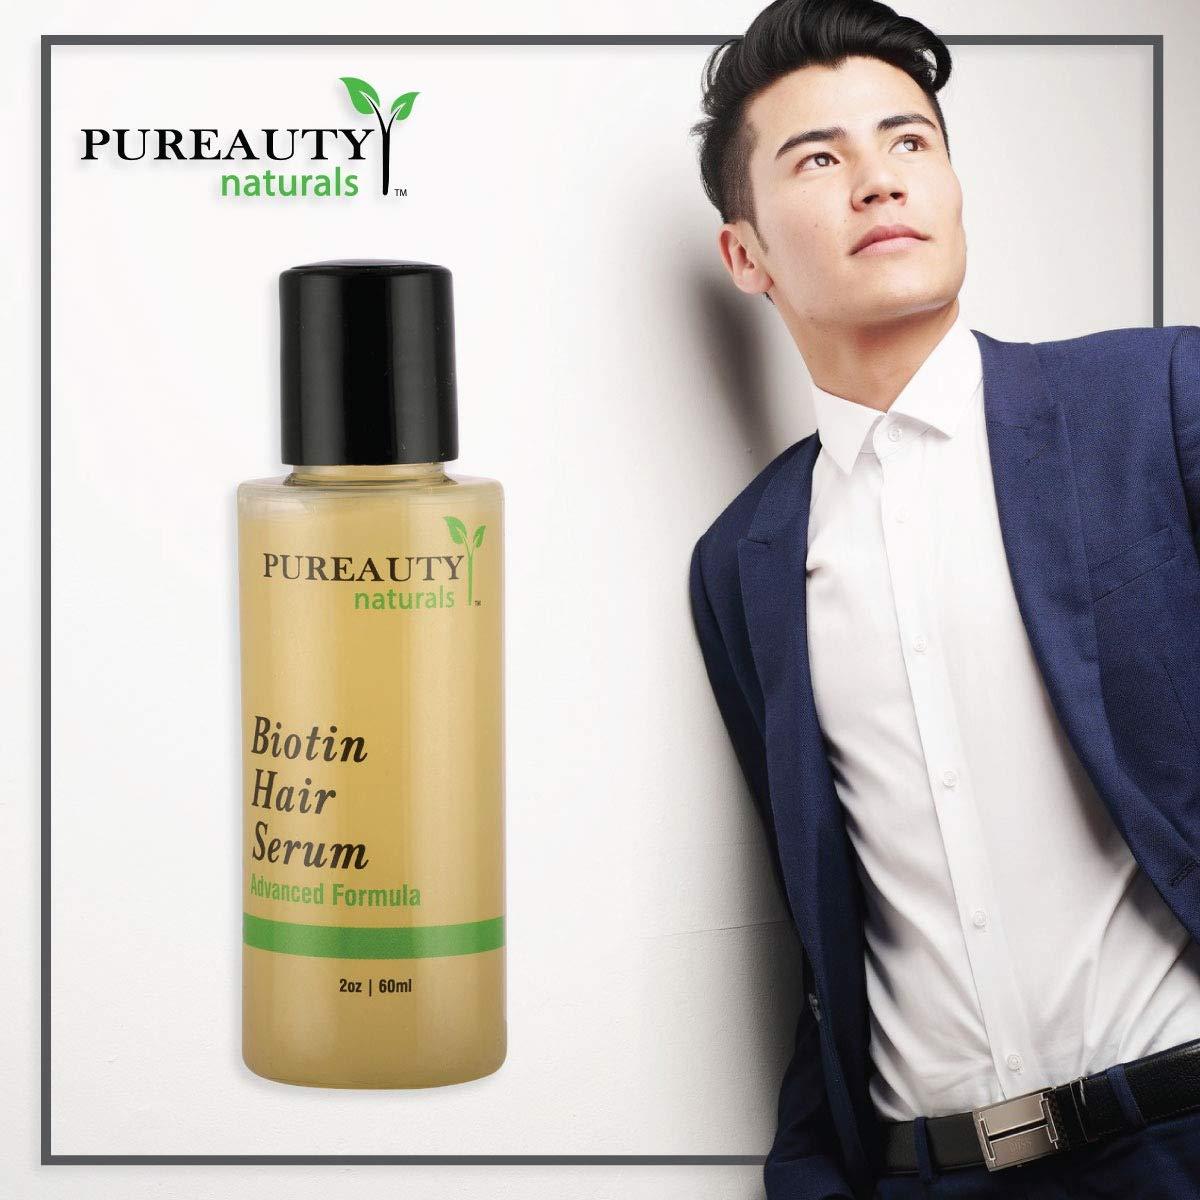 Biotin Hair Growth Serum by Pureauty Naturals